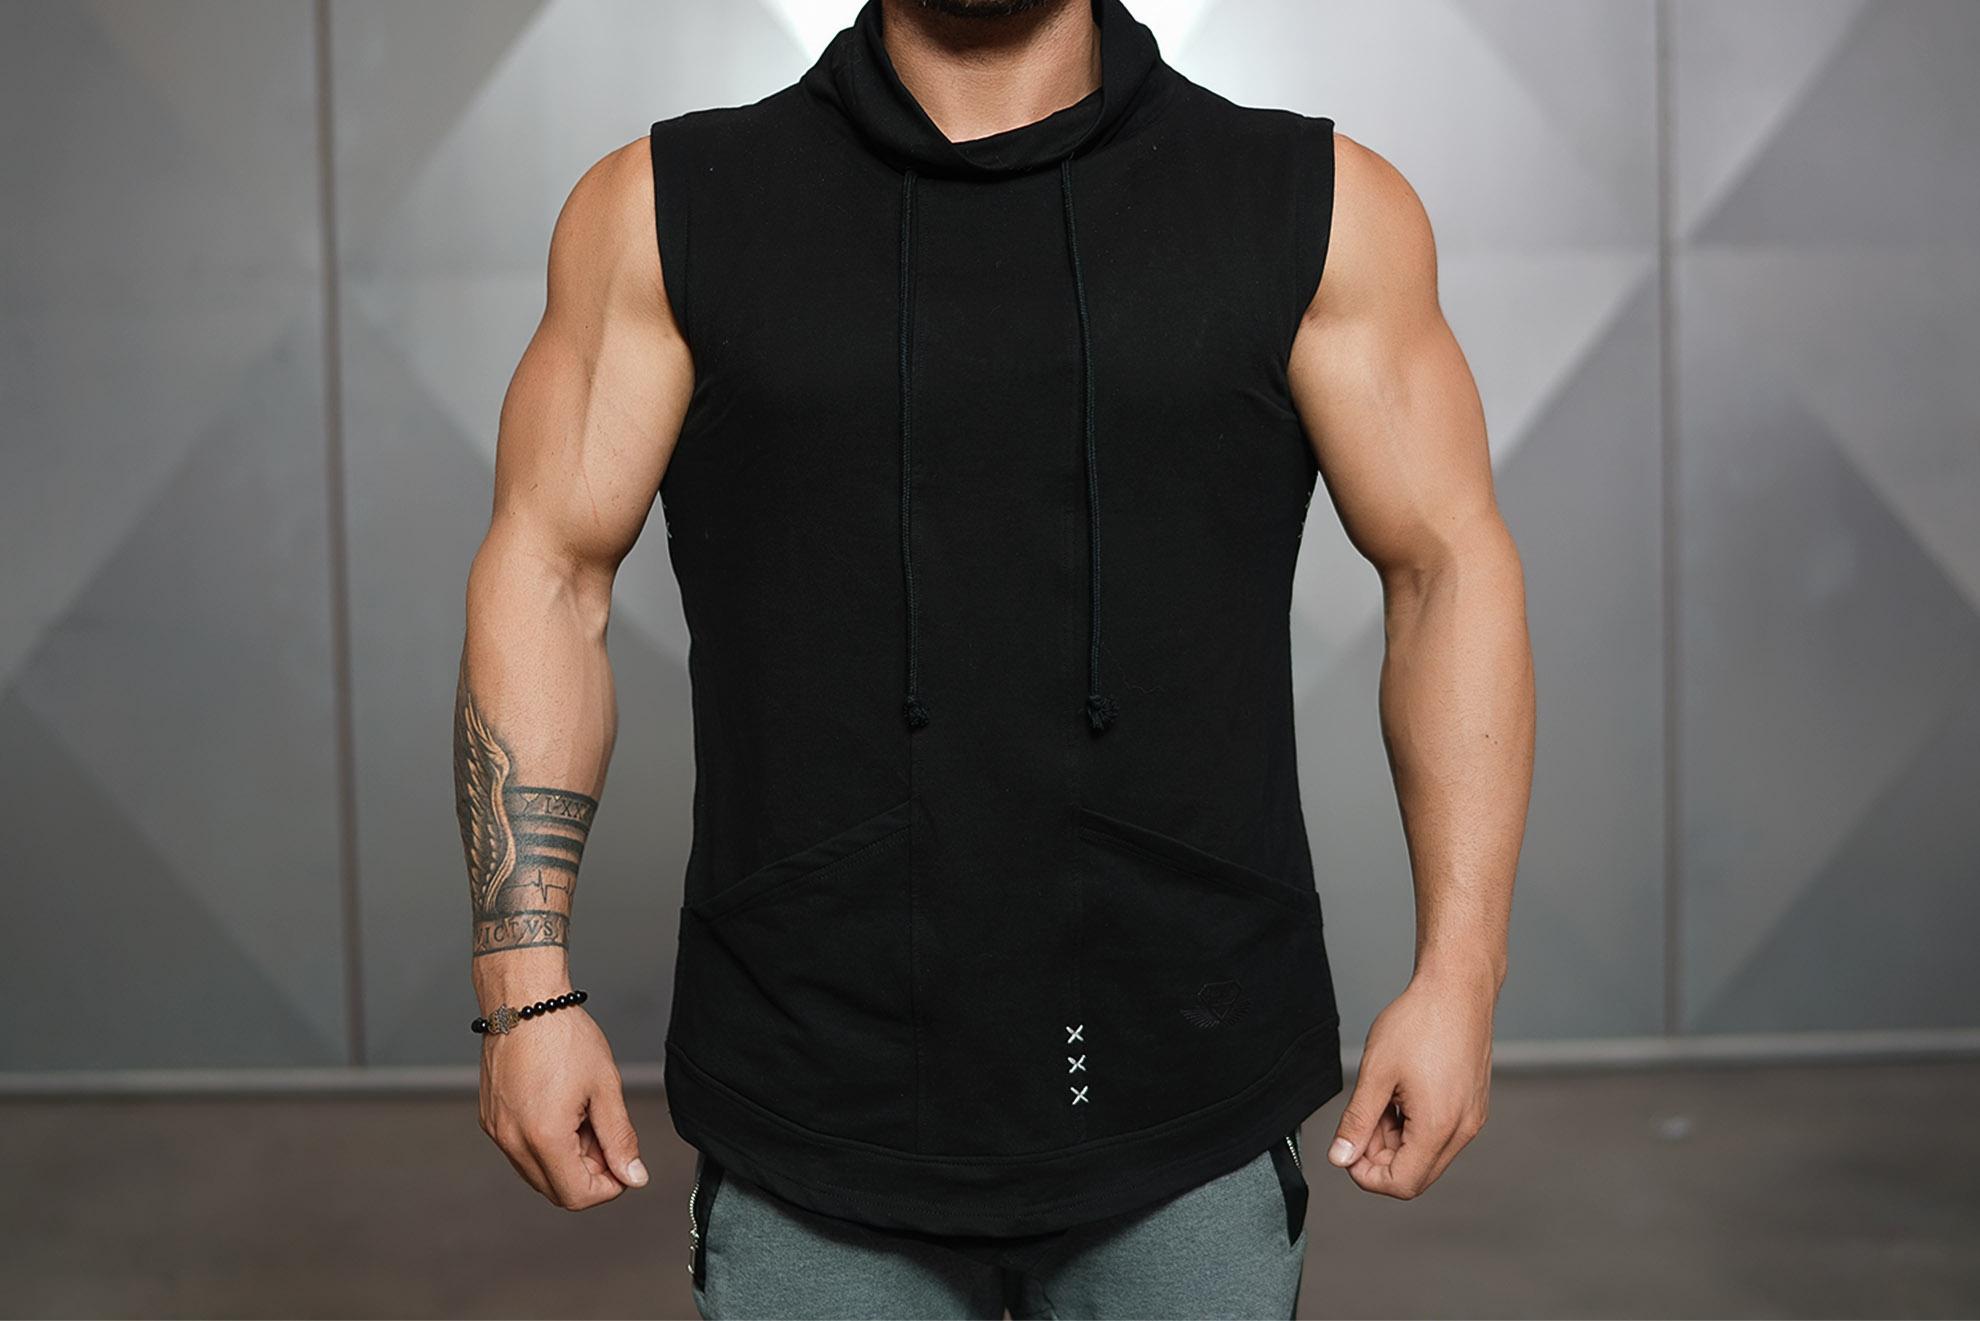 neri sleeveless vest black body engineers international shop. Black Bedroom Furniture Sets. Home Design Ideas